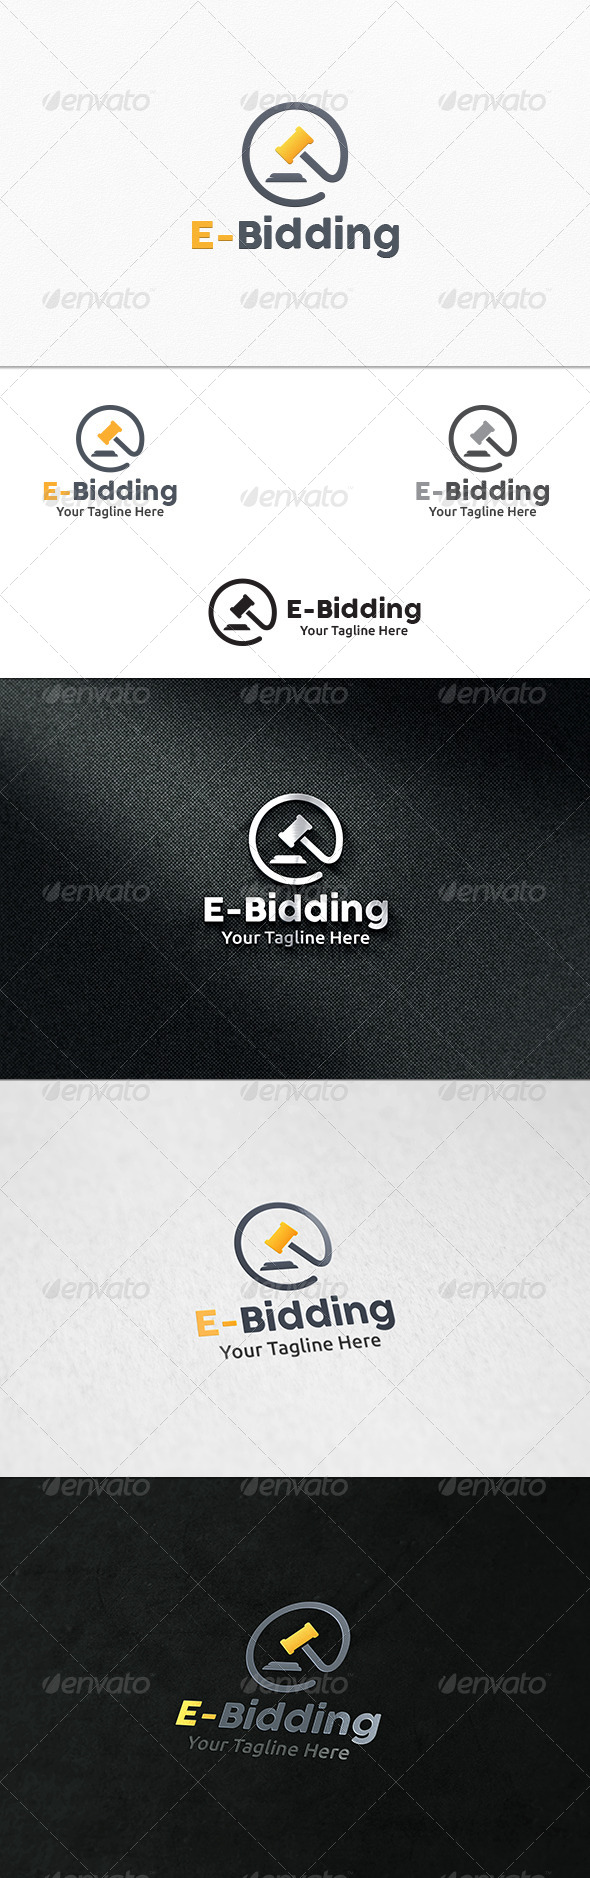 GraphicRiver E- Bidding Logo Template 7894592